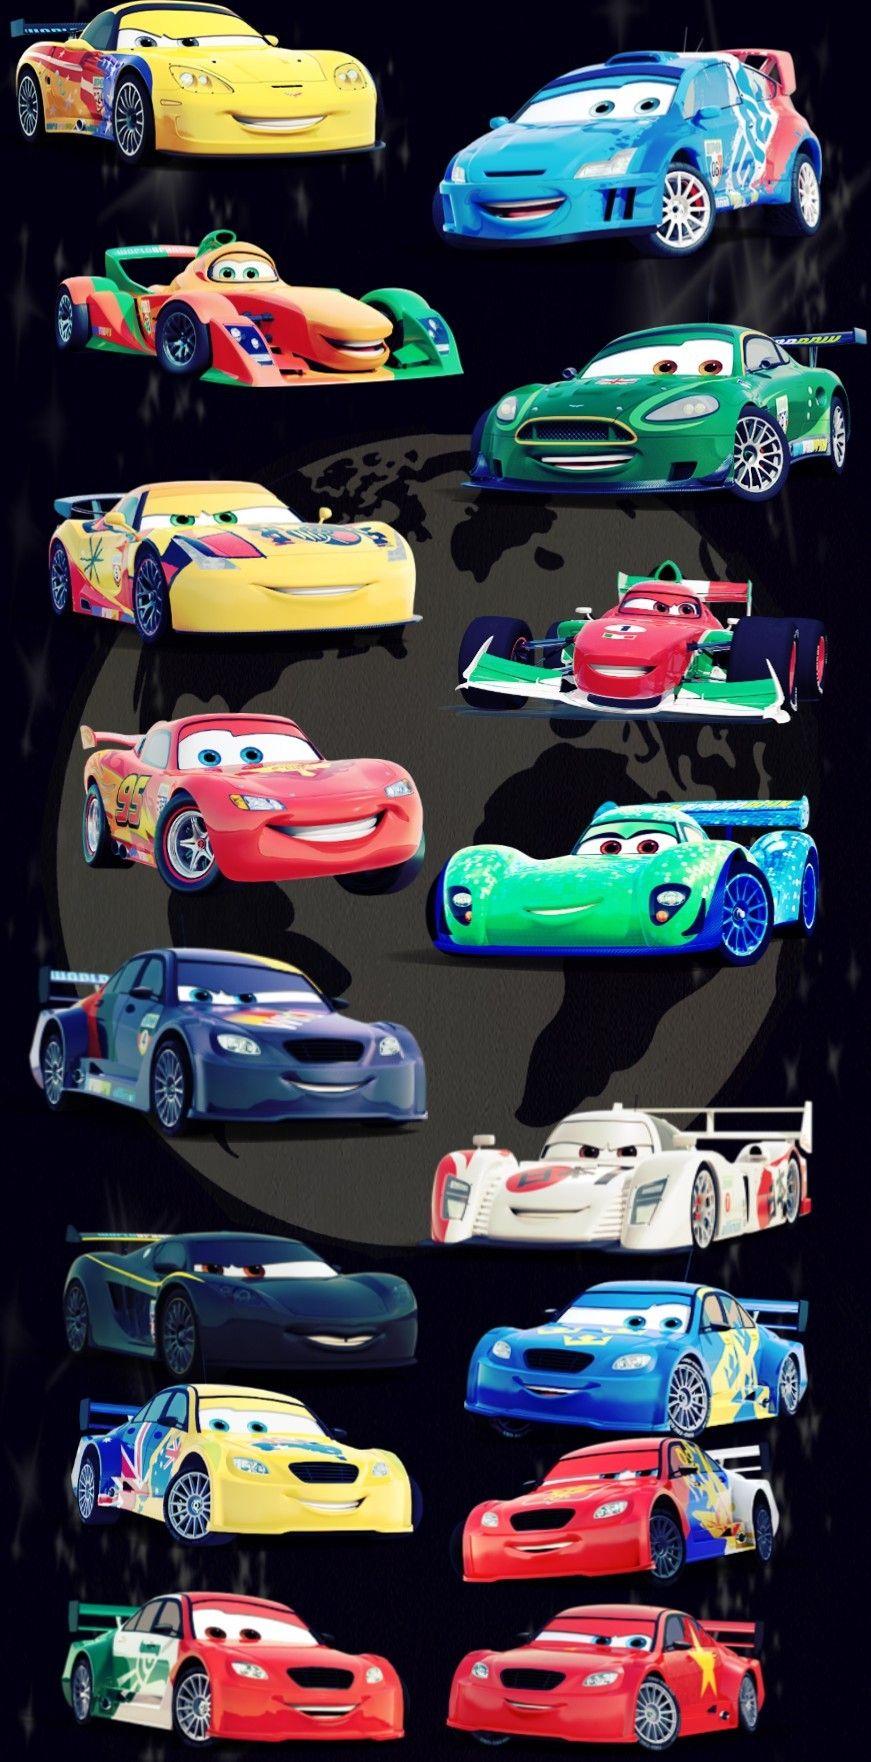 Disney Cars 2 Racers Disney Cars Wallpaper Disney Cars Pixar Cars [ 1762 x 871 Pixel ]